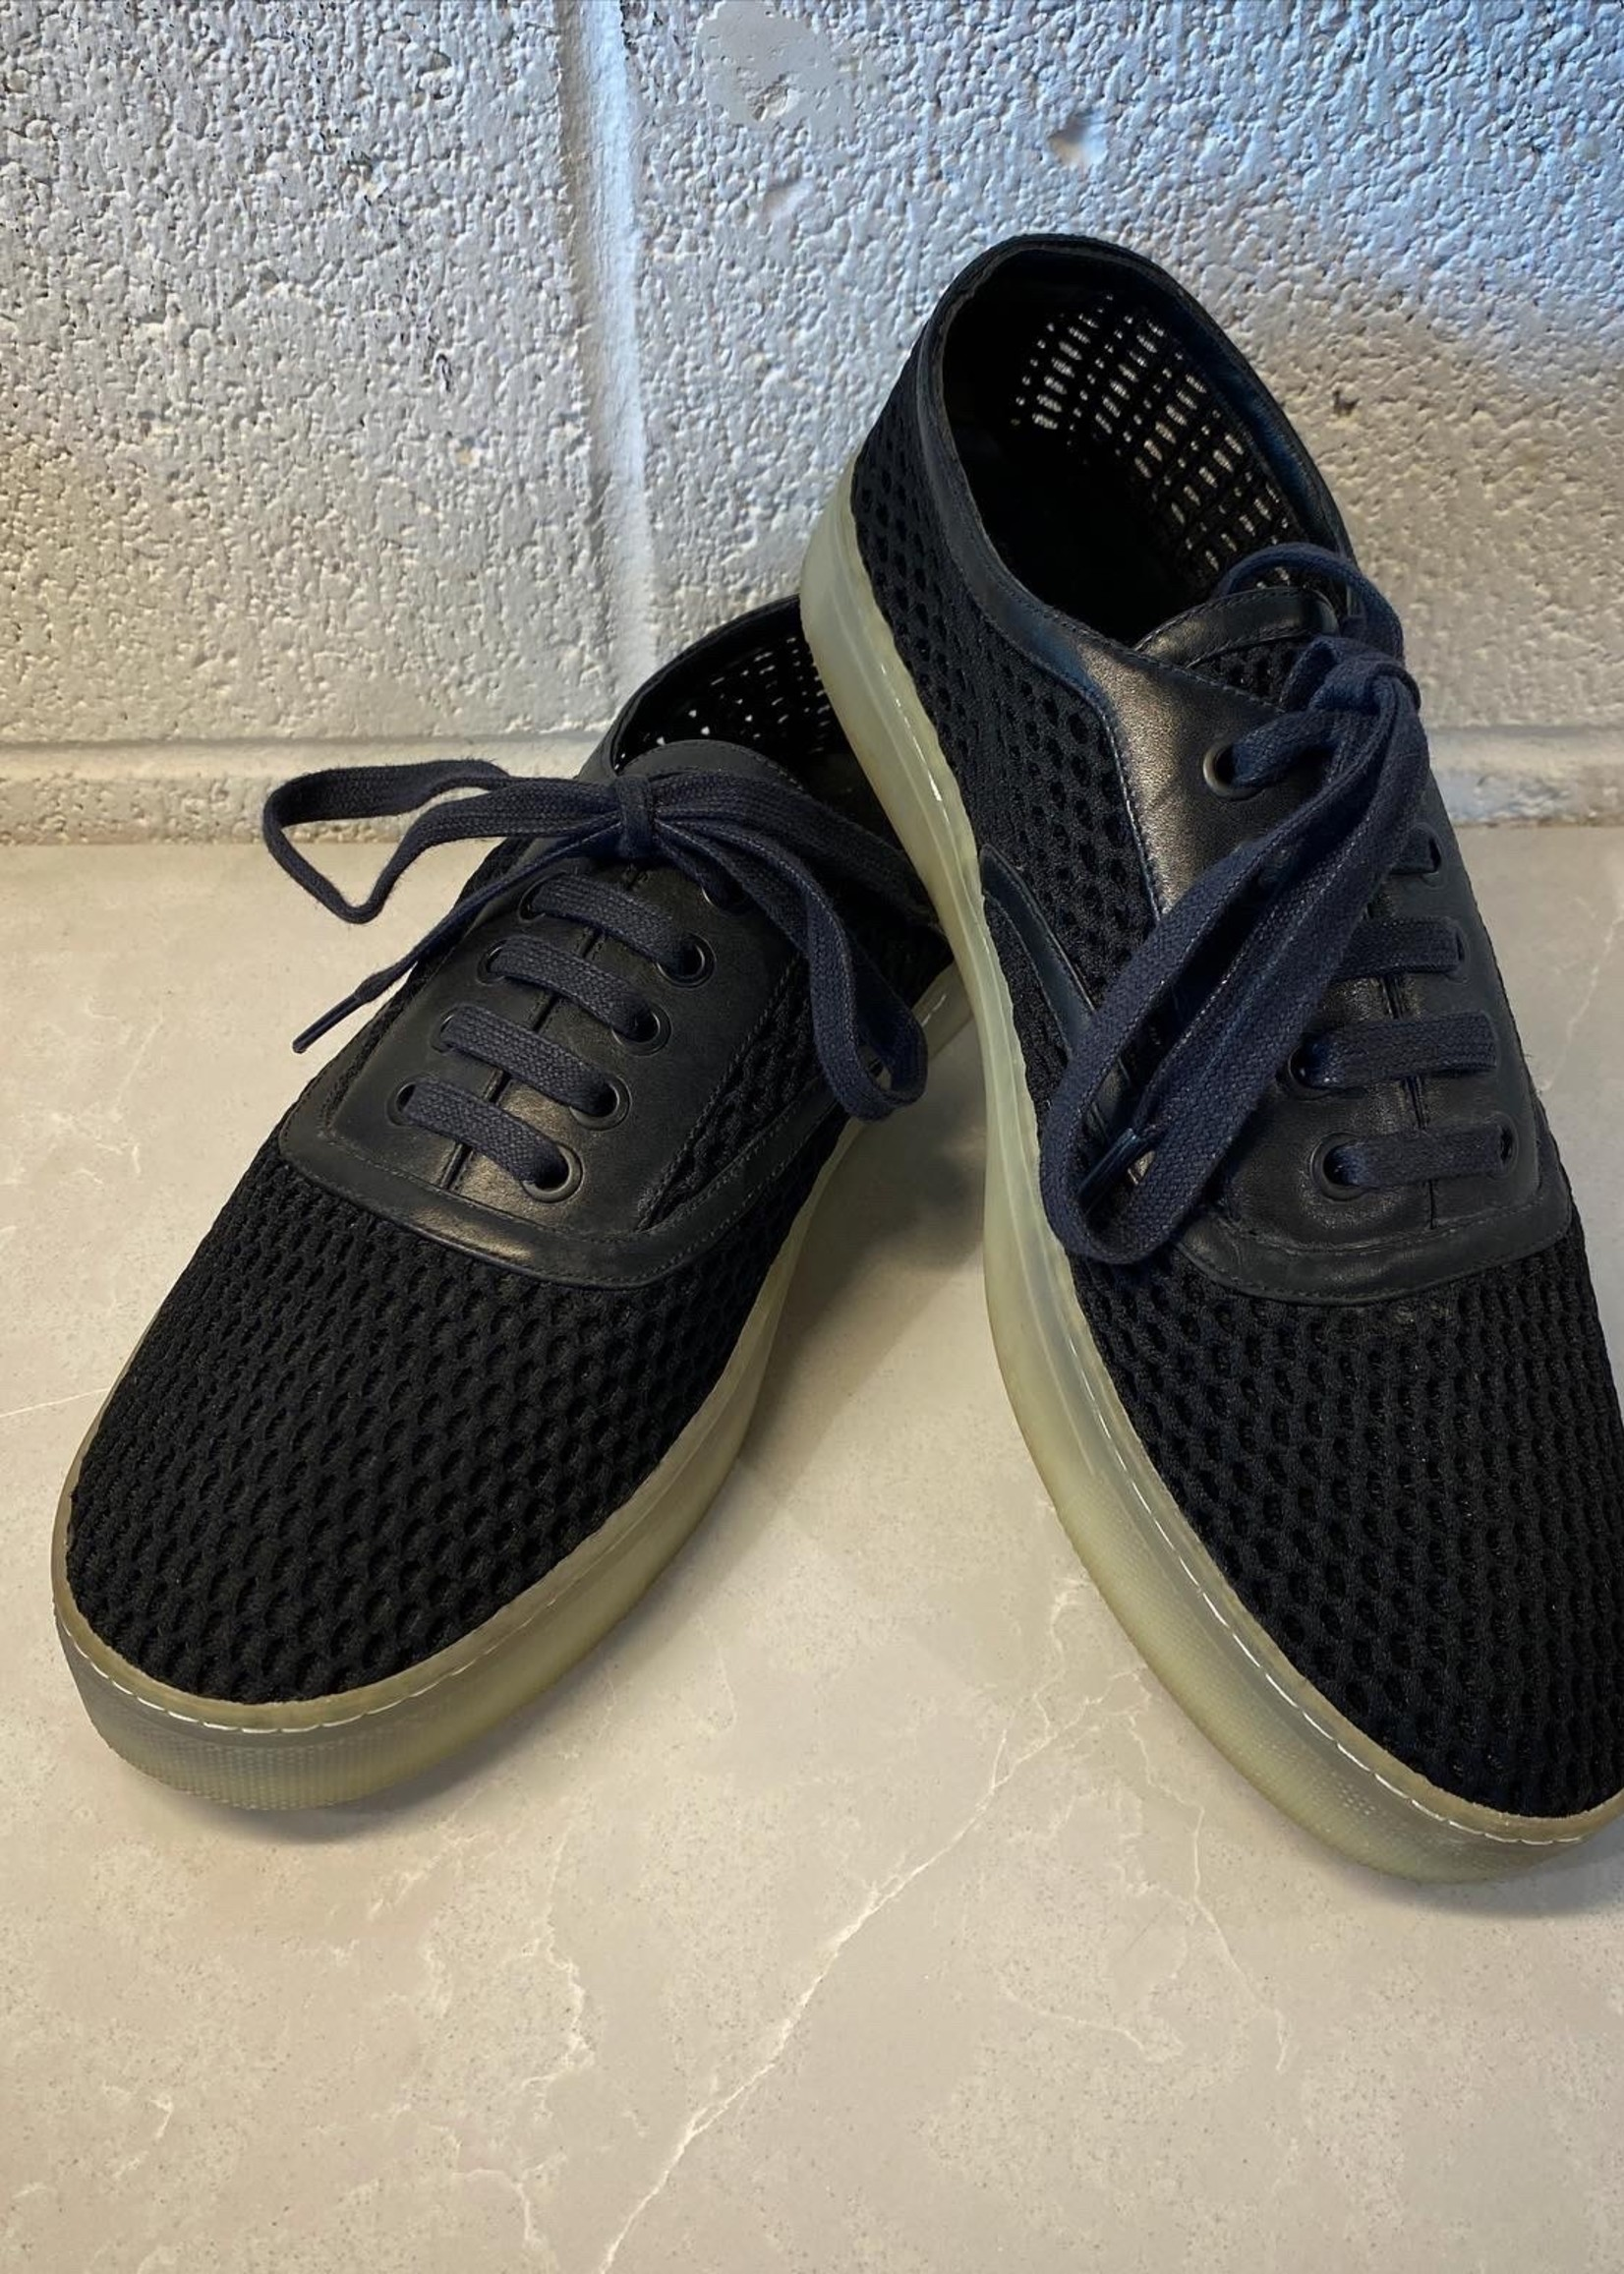 Alexander Wang Mesh Jess Low Black Sneakers 40